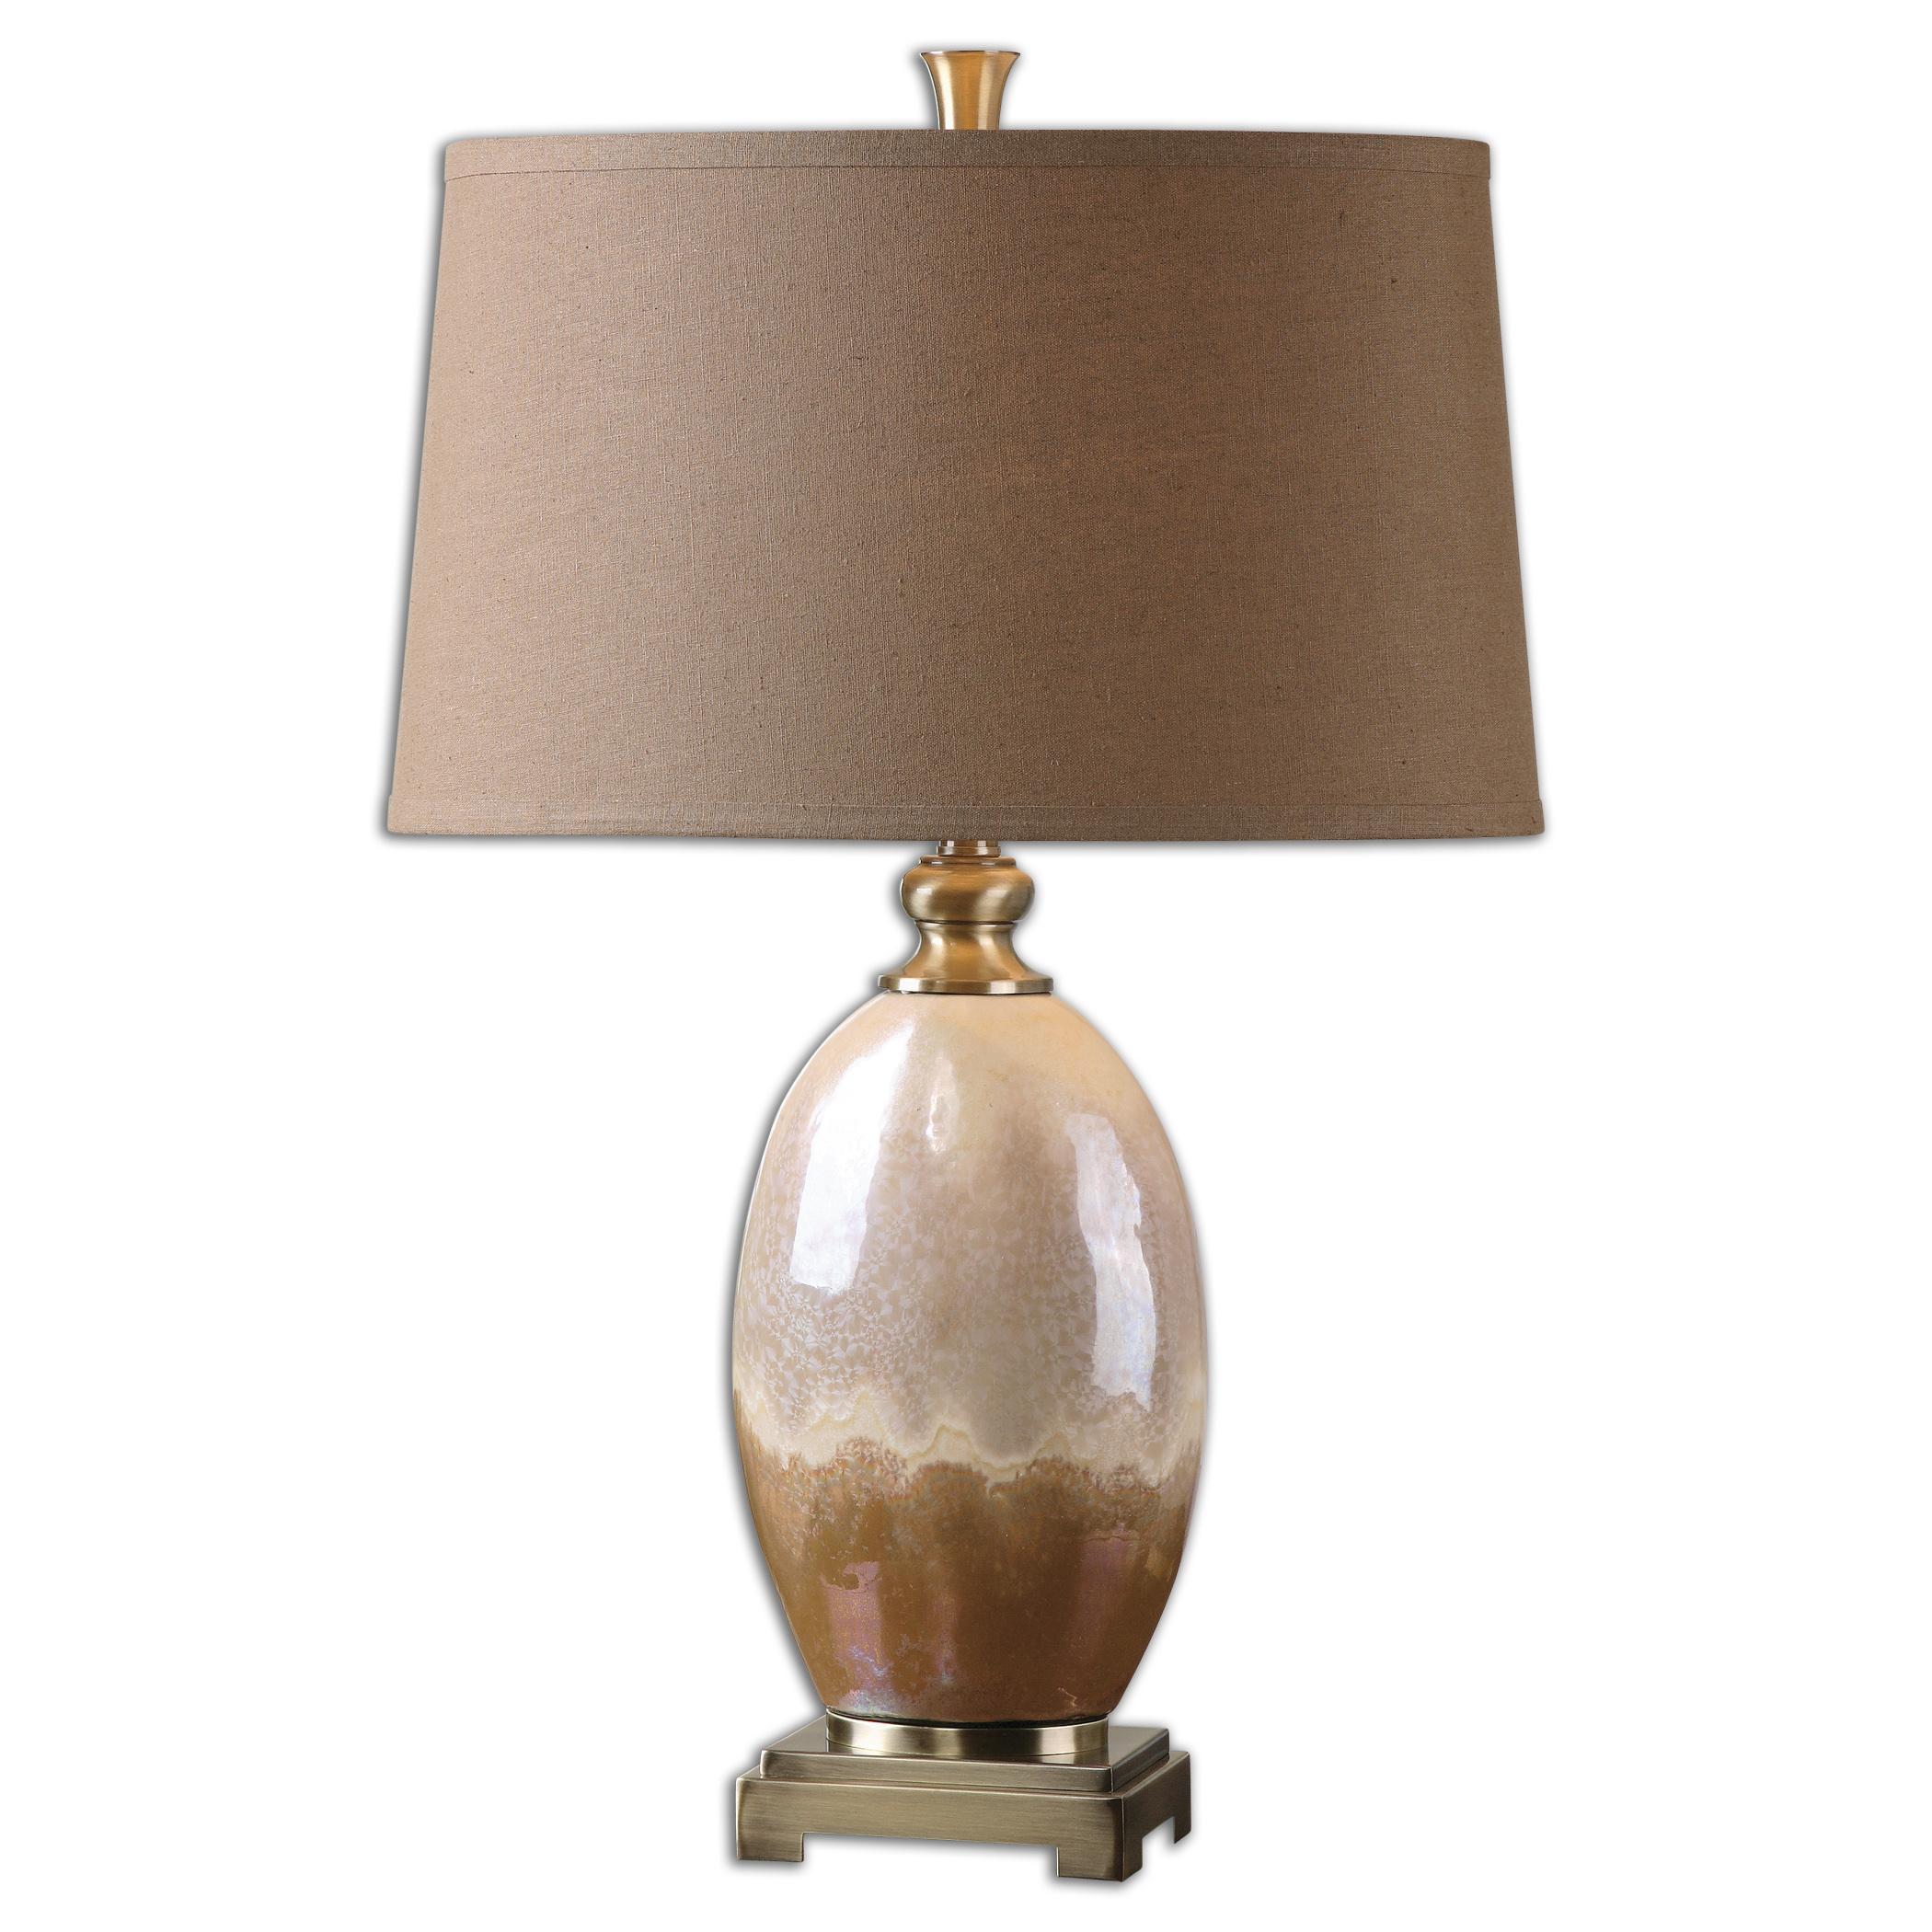 Table Lamps Eadric Ceramic Table Lamp at Ruby Gordon Home